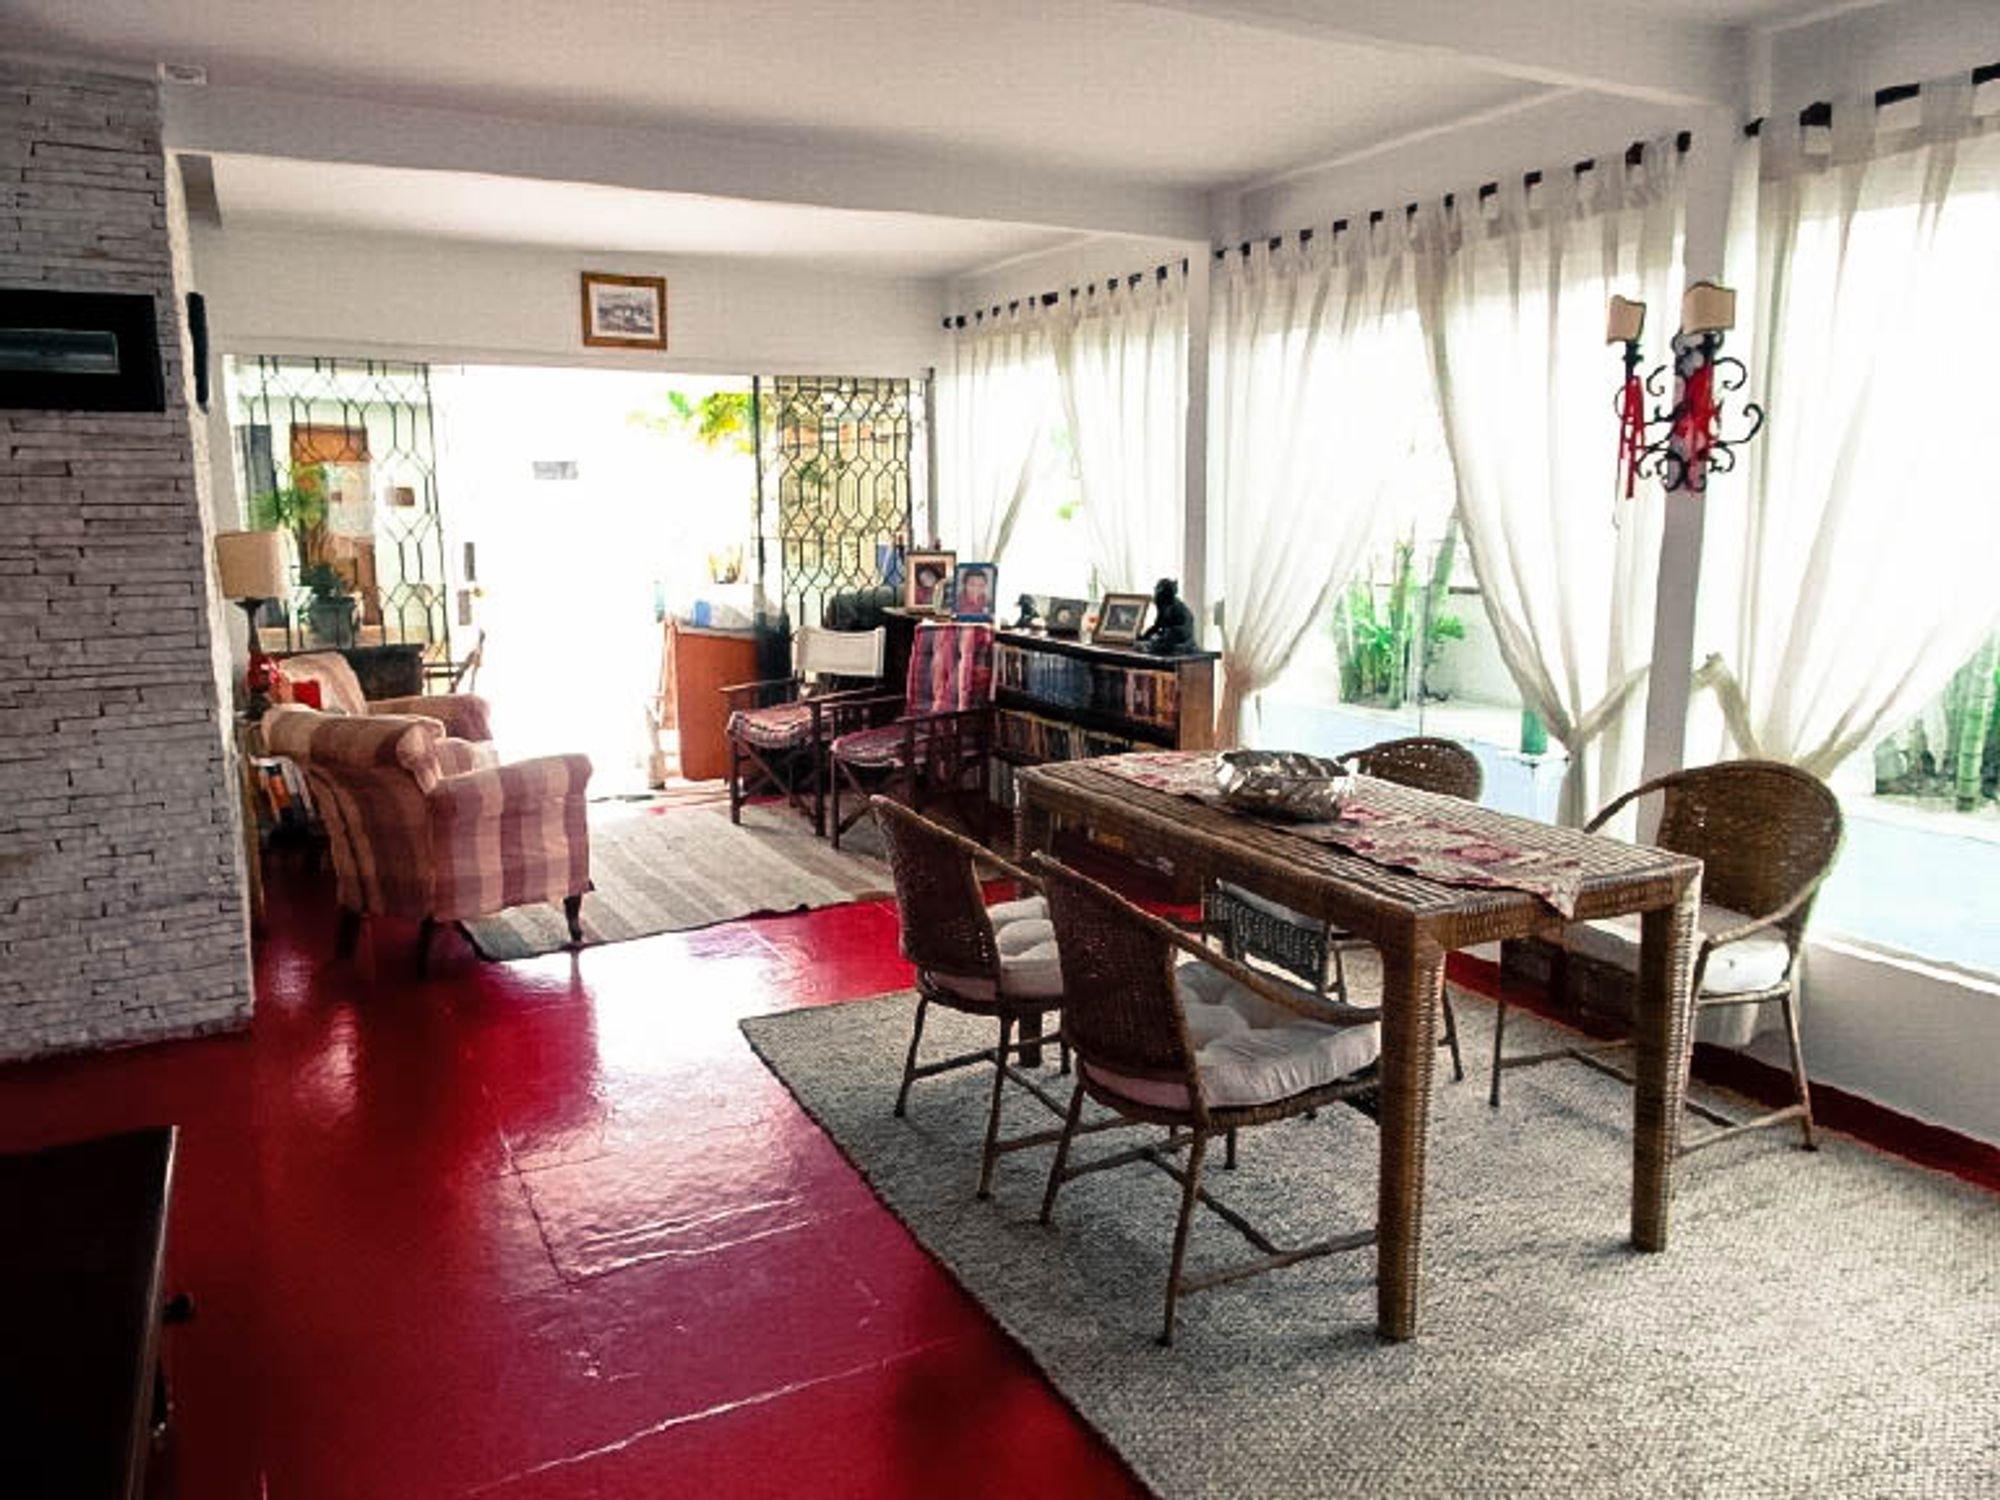 Foto de Sala com vaso de planta, tigela, cadeira, livro, mesa de jantar